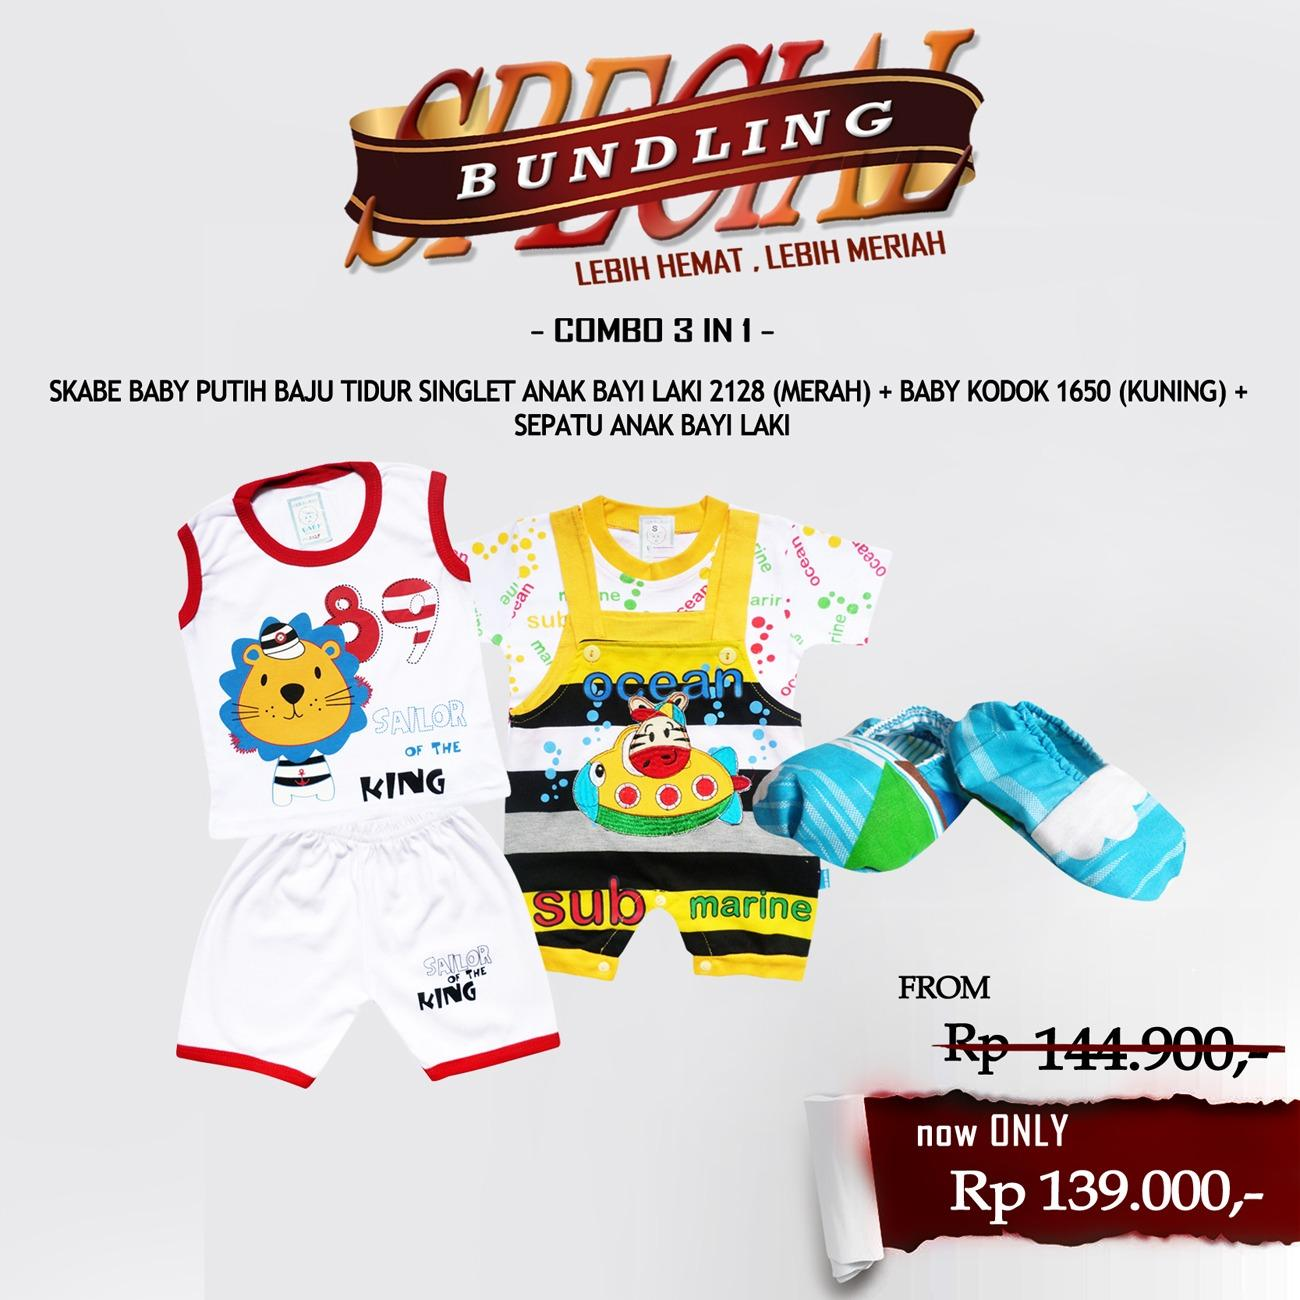 Paket Hemat Waka Set Pakaian Baju Anak Laki dengan Sepatu Anak Bayi Laki - Kode L